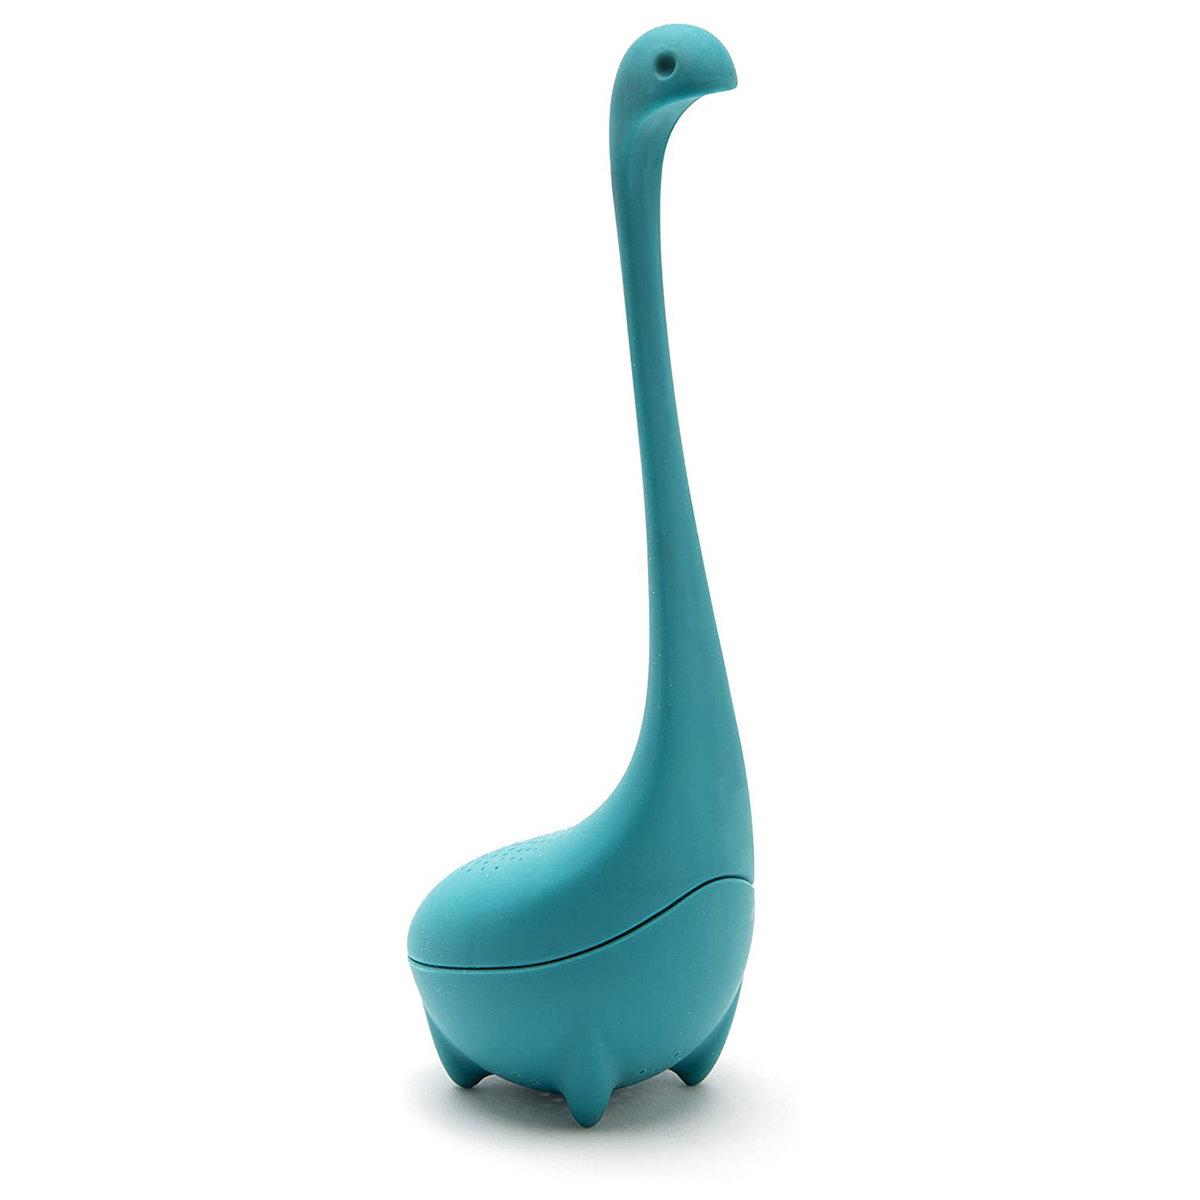 BABY NESSIE 尼斯寶寶泡茶器湖水藍